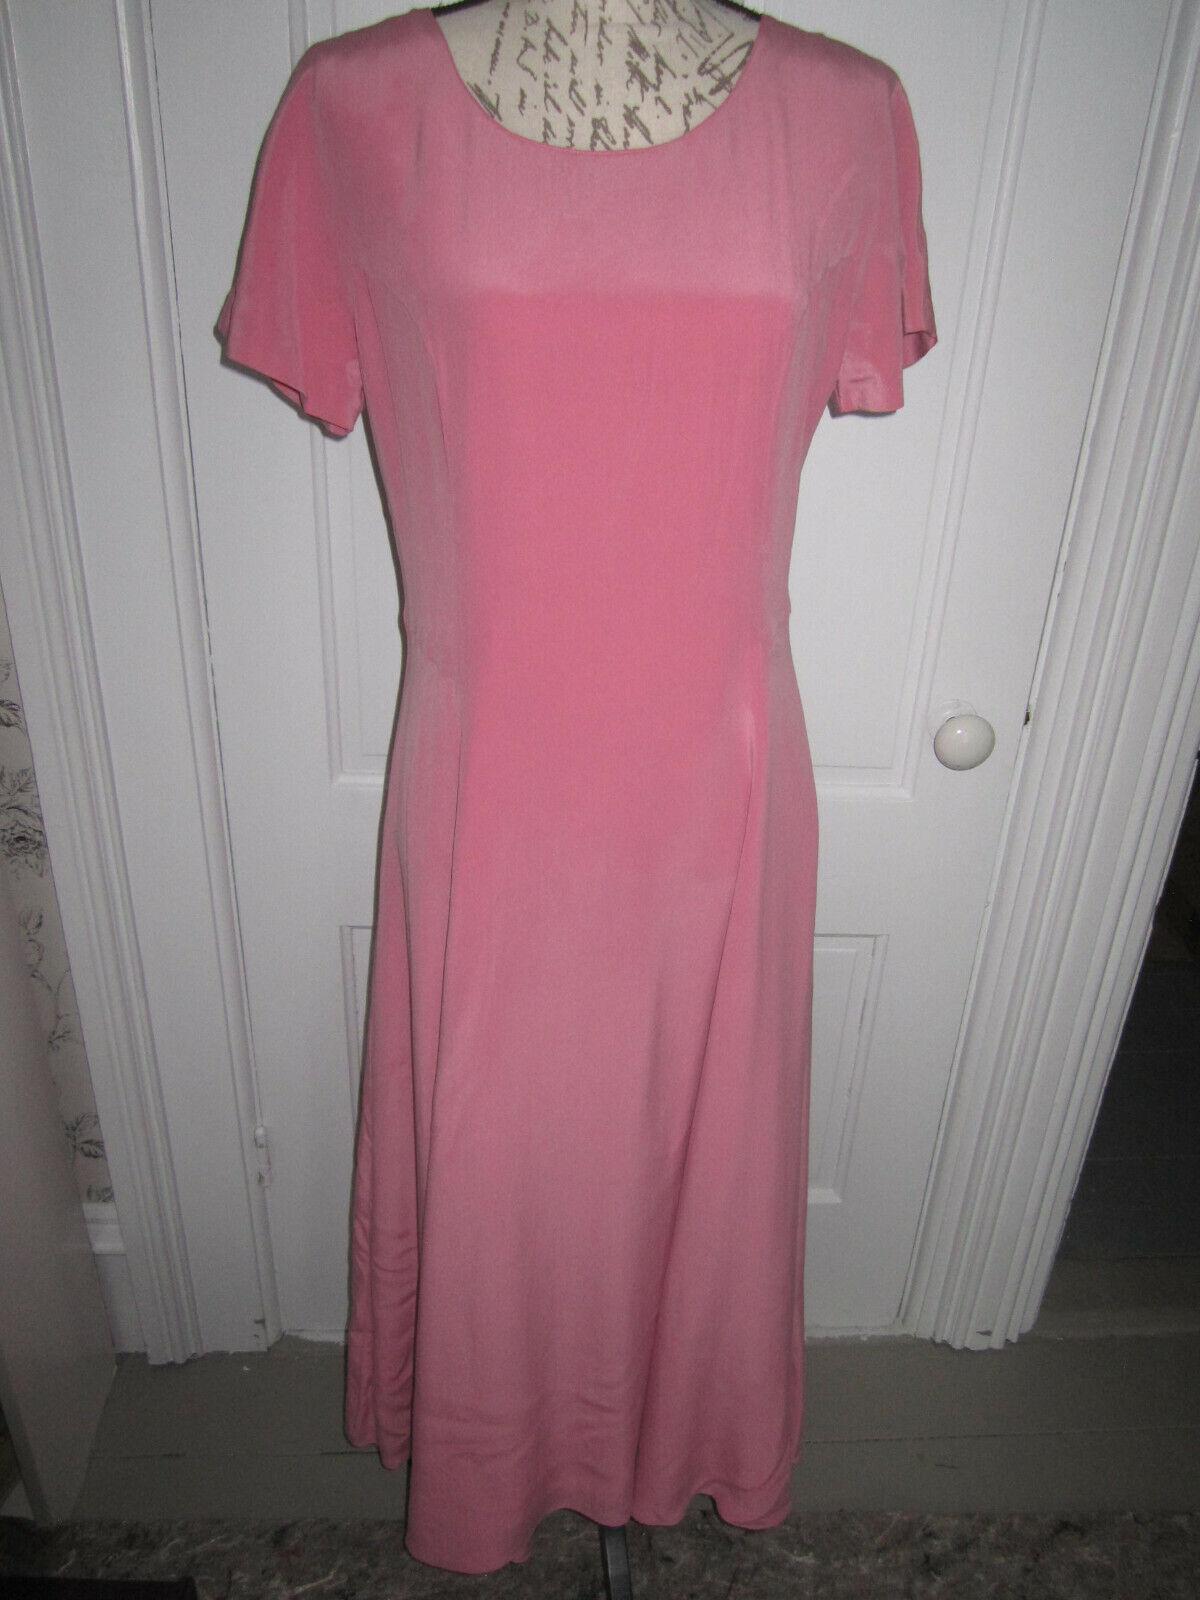 NWT NWT NWT Laura Ashley brand pink silk short sleeved full length dress, ladies' sz 10 a31e92